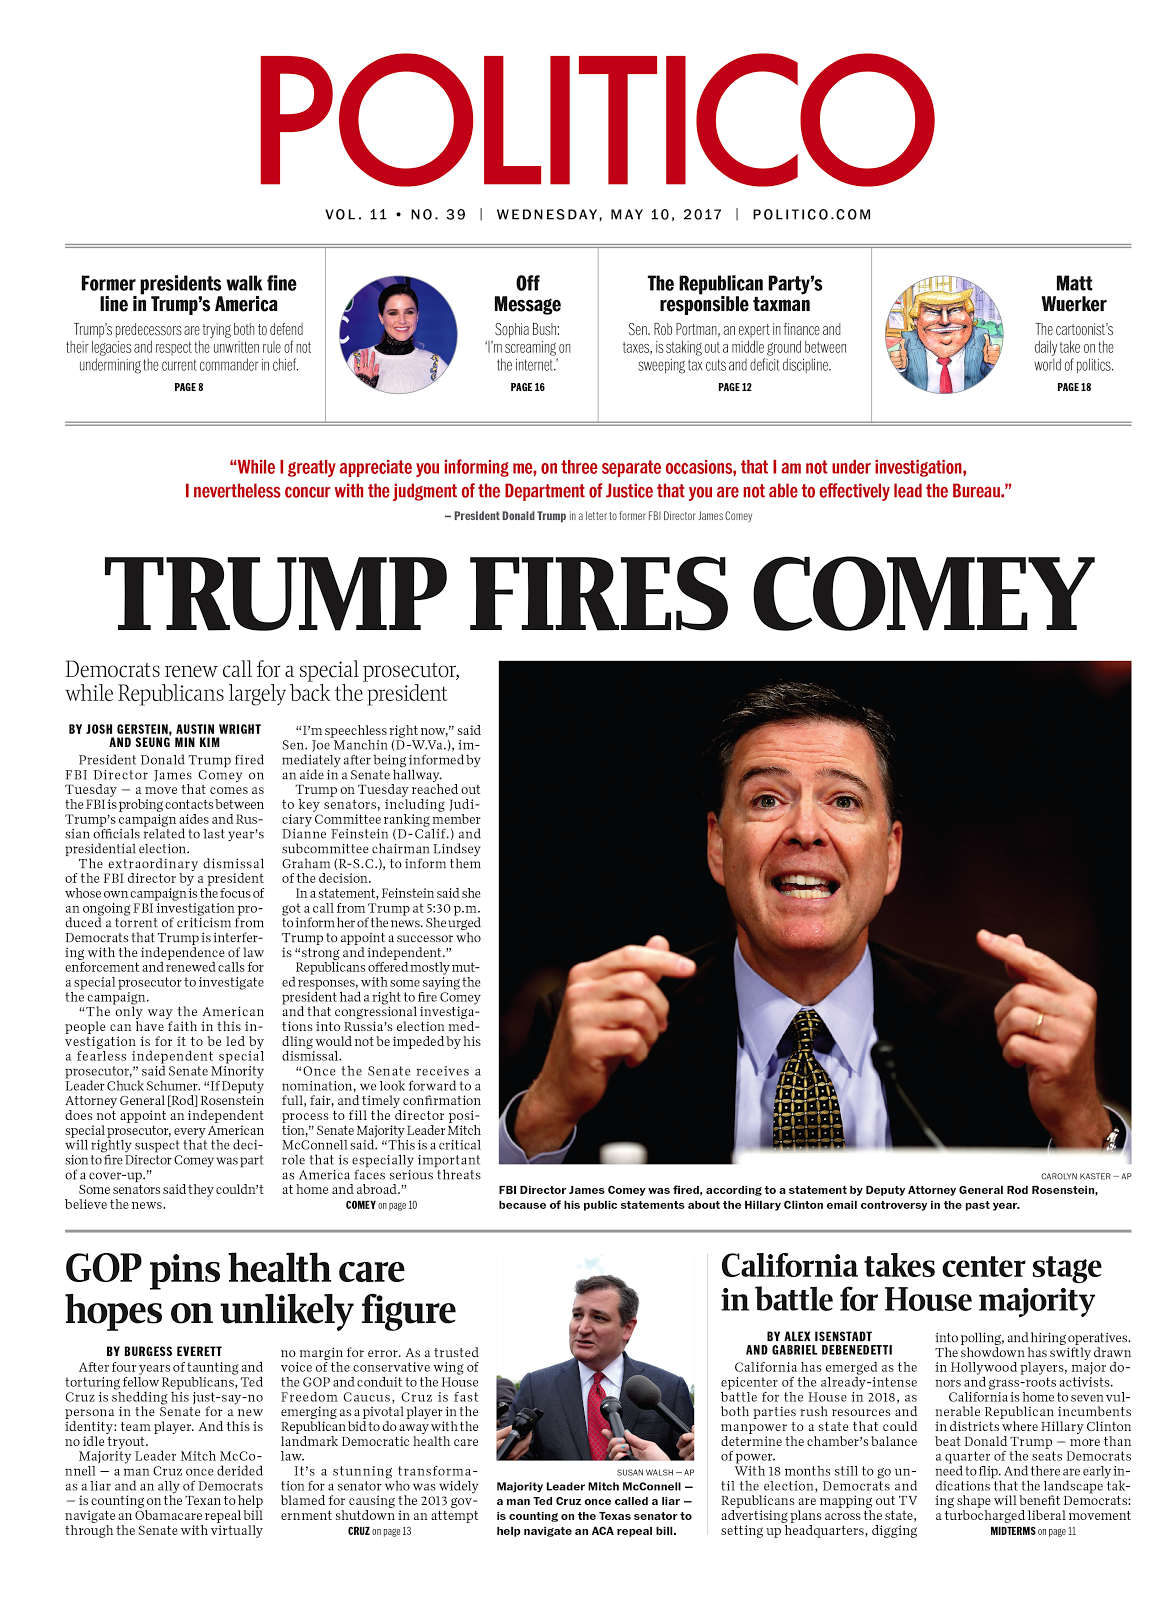 Trump fires Comey